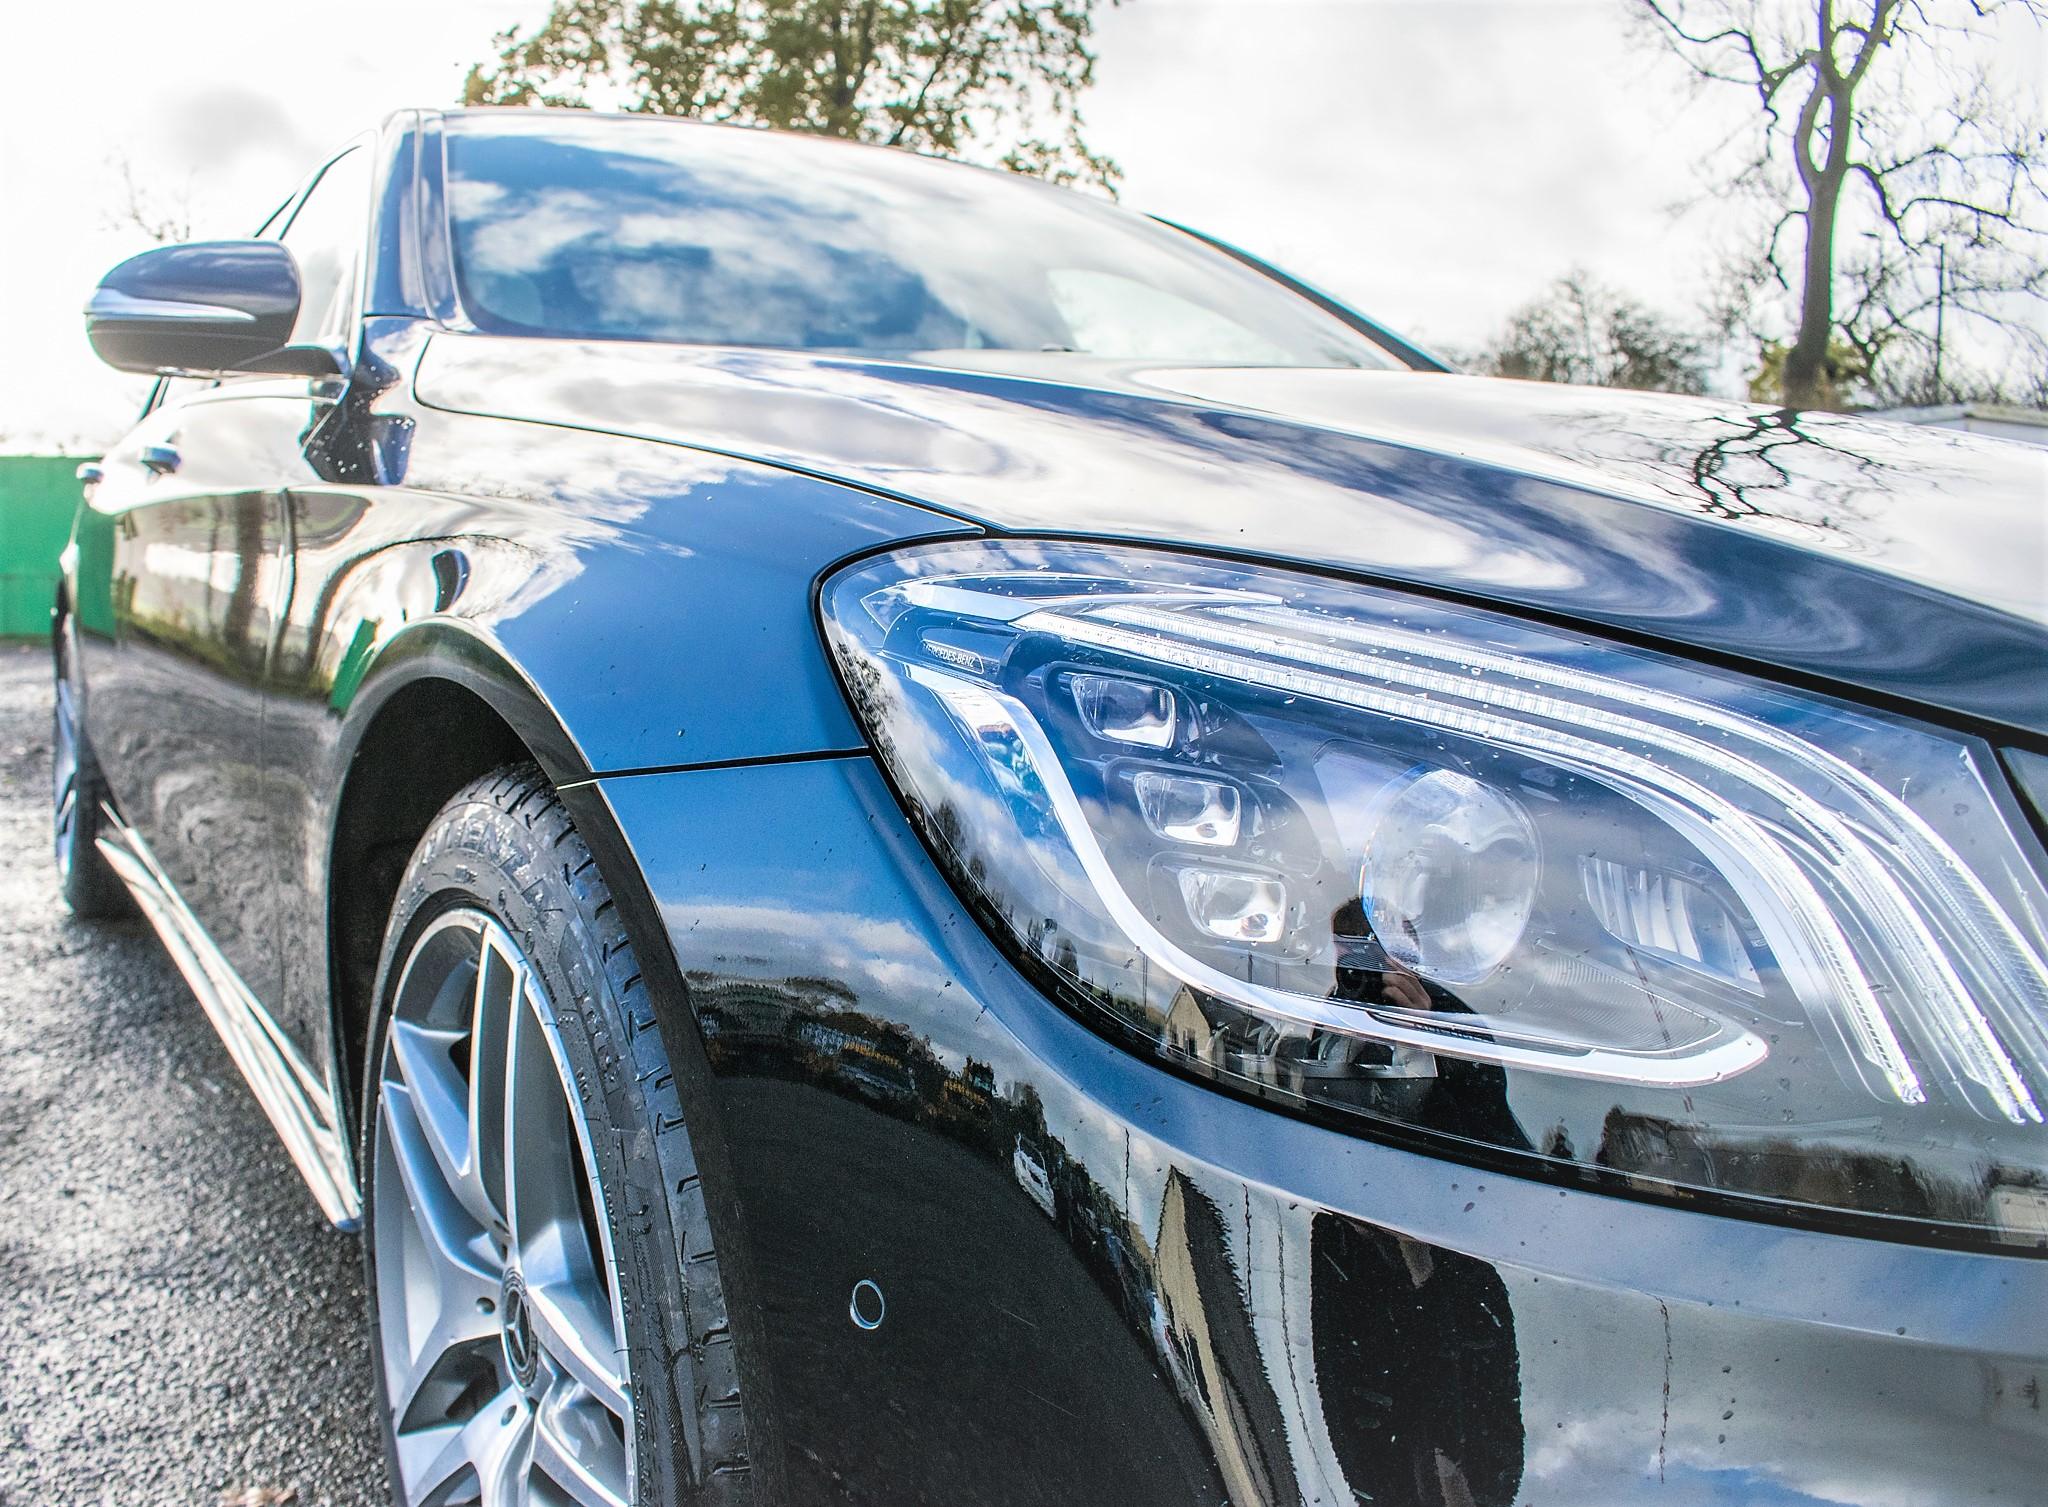 Mercedes Benz S450 L AMG Line Executive auto petrol 4 door saloon car Registration Number: FX68 - Image 13 of 30